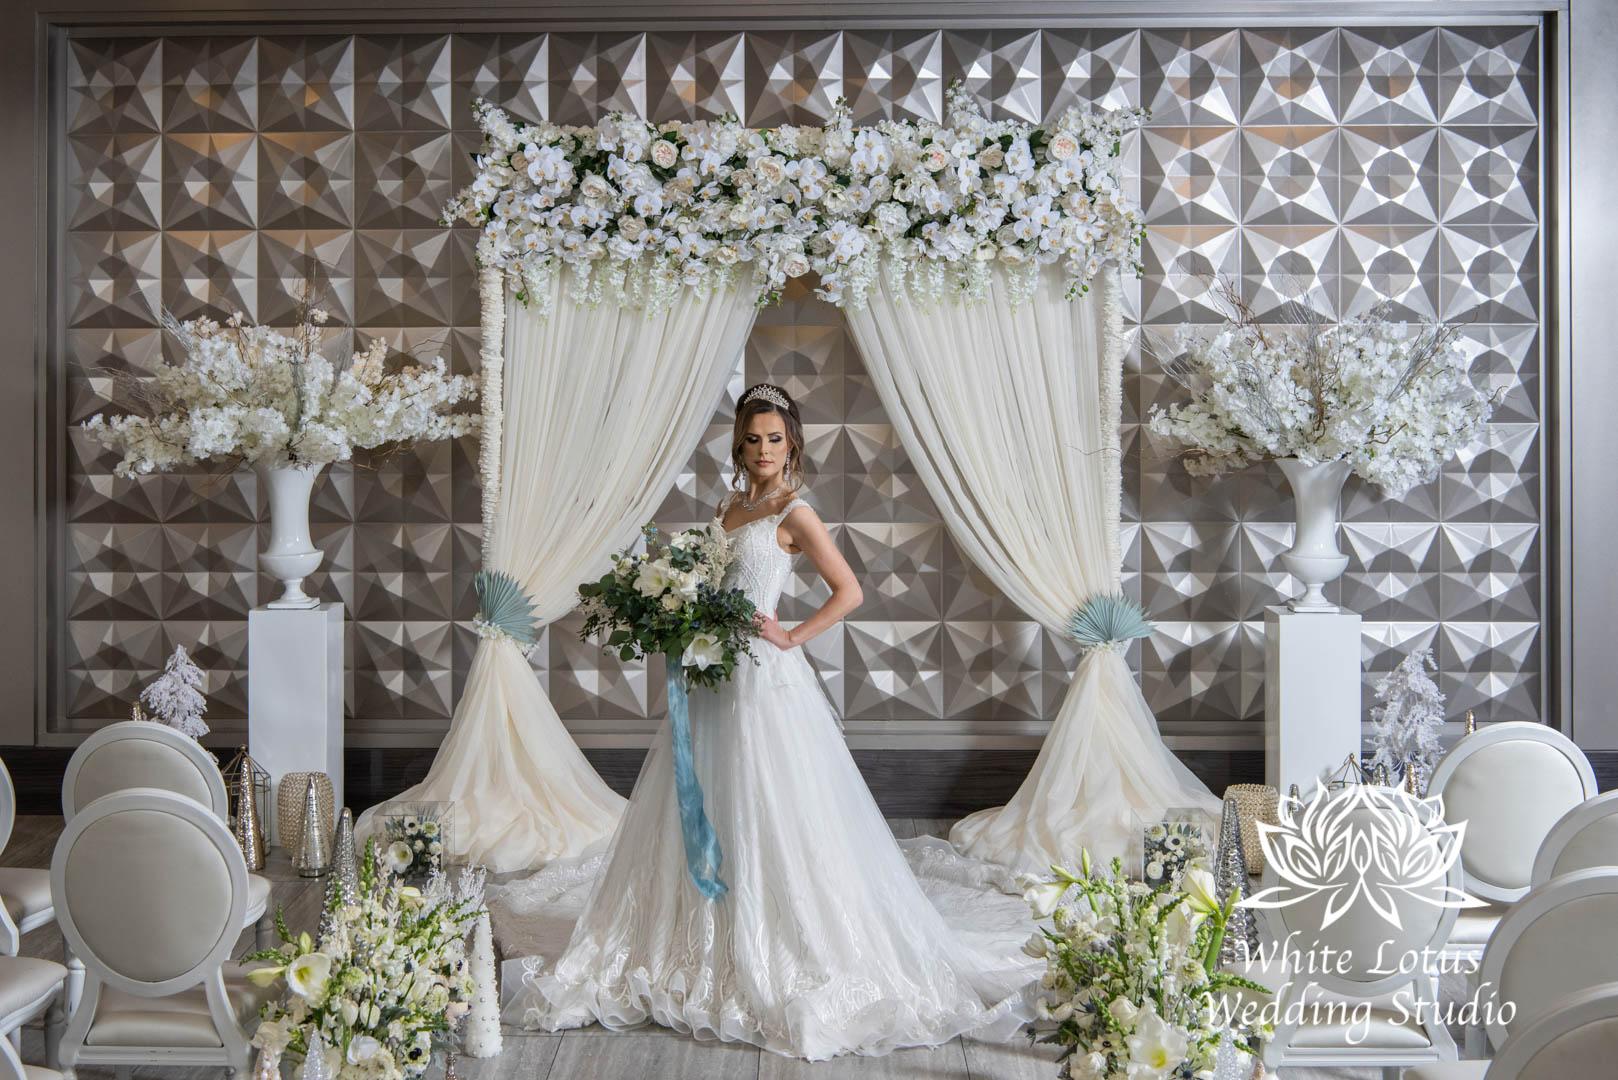 008- GLAM WINTERLUXE WEDDING INSPIRATION